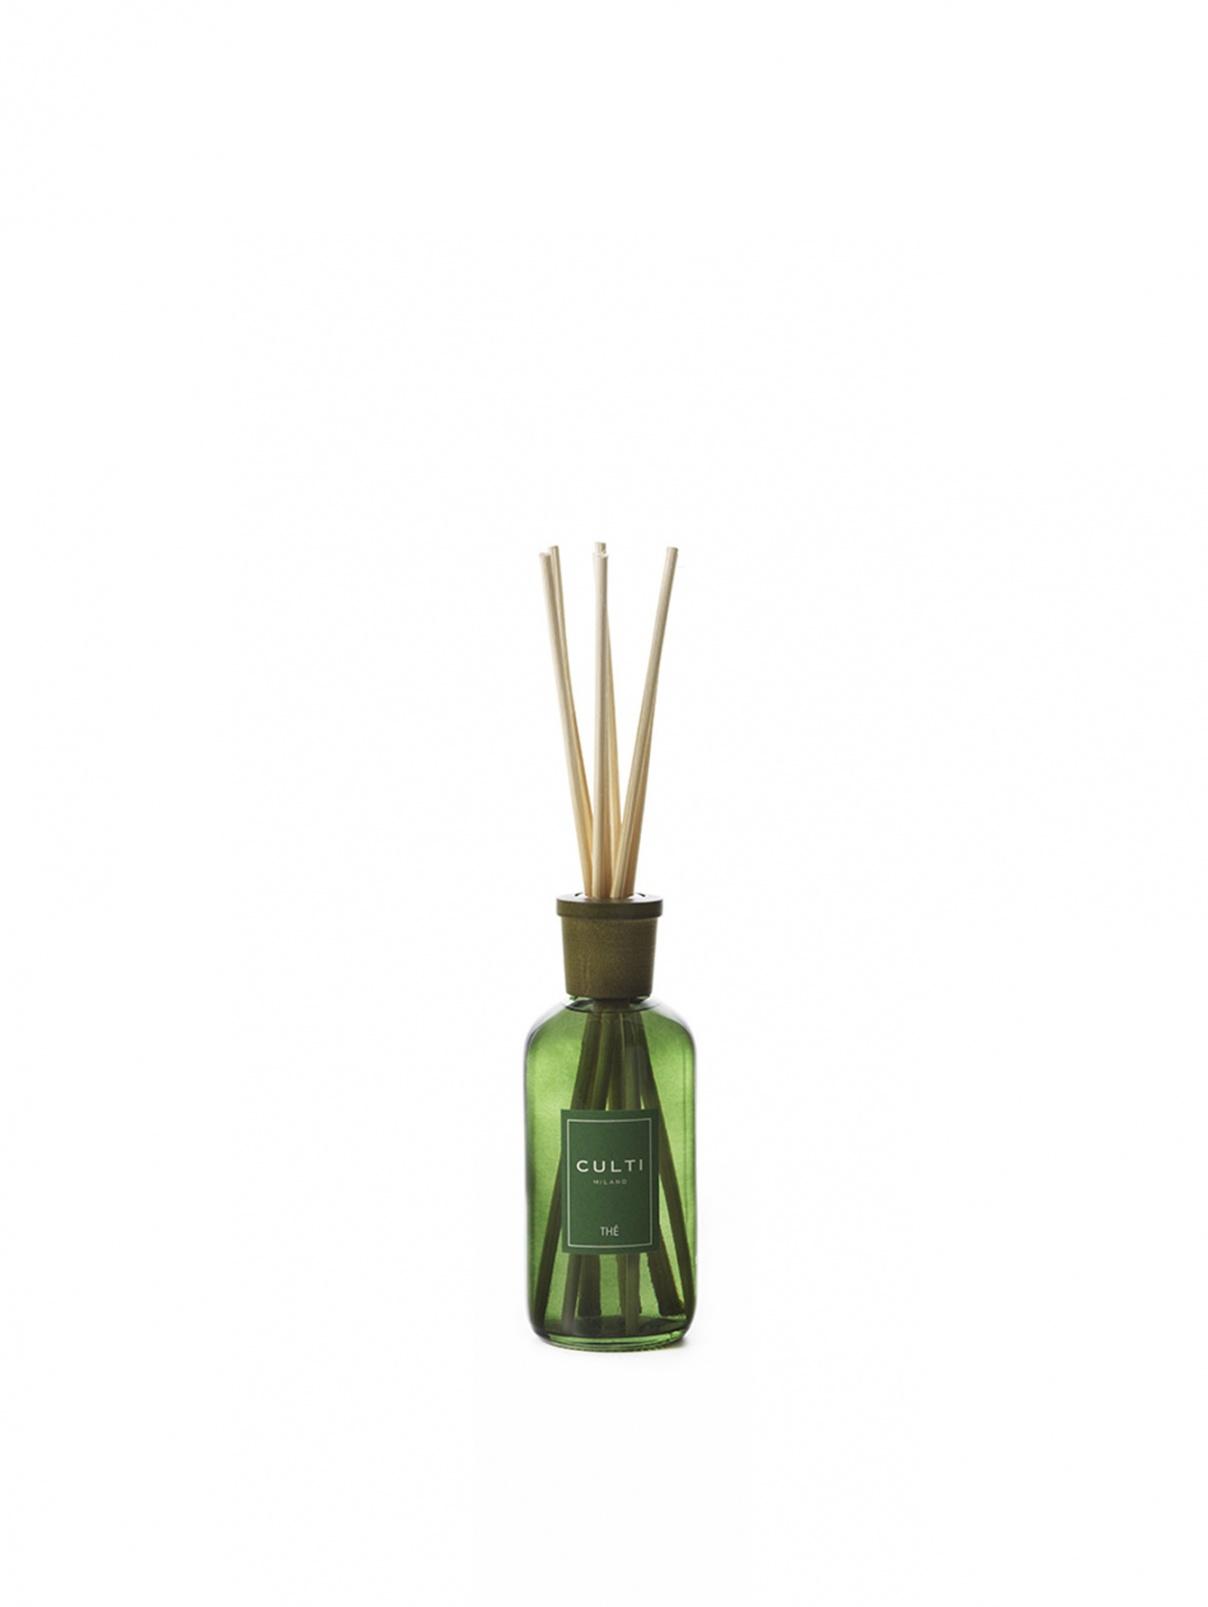 Stile Colours Green диффузор The 250 мл Home Fragrance Culti Milano  –  Общий вид